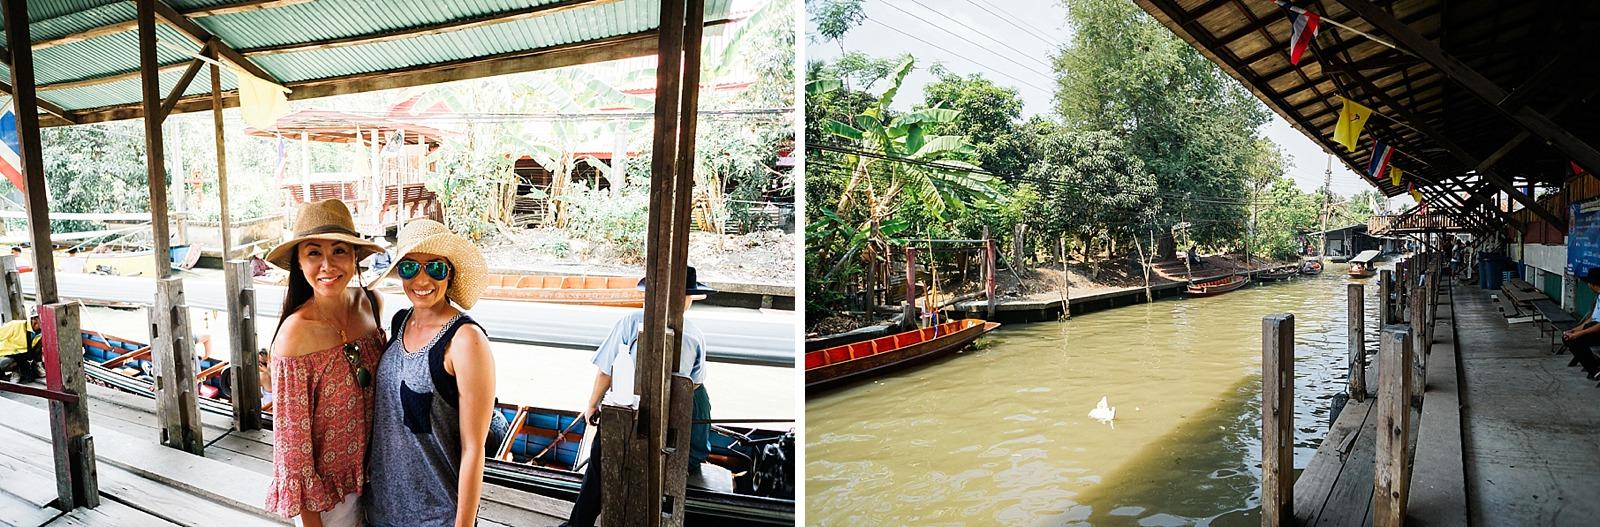 Thailand-diana-elizabeth-travel-blogger-phoenix-226